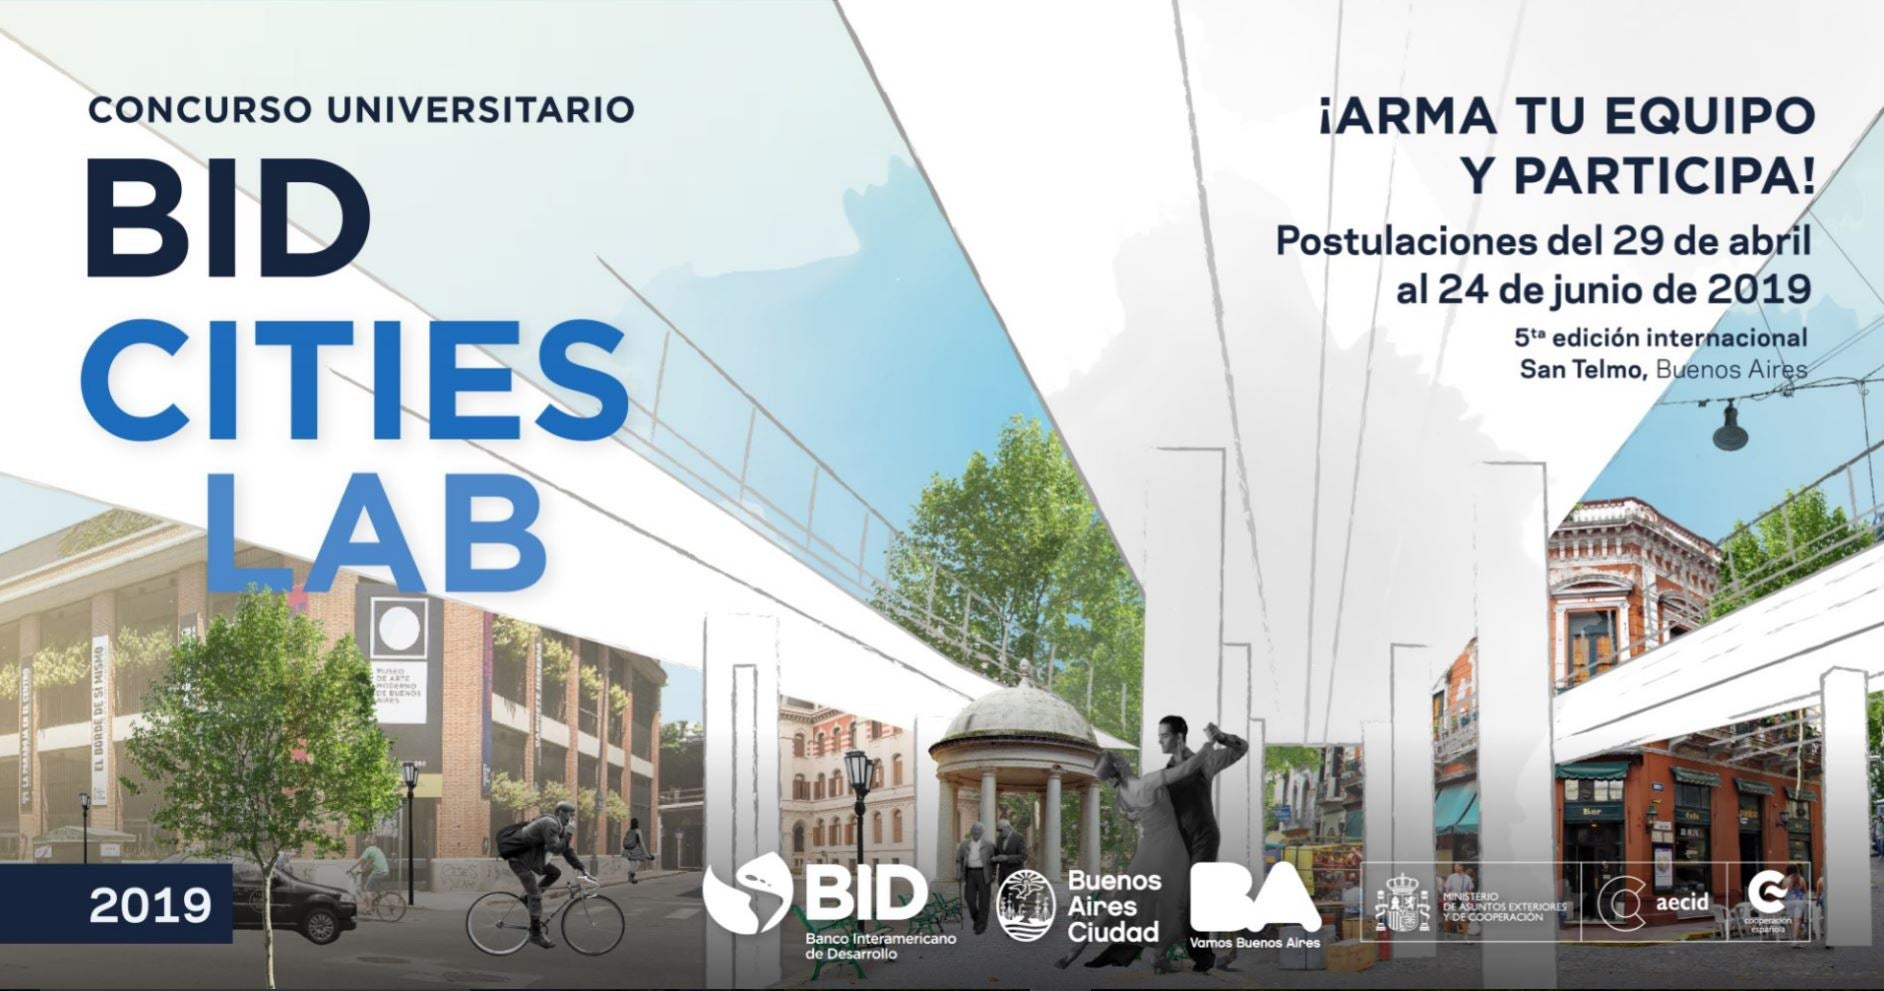 Concurso BID CitiesLab 2019, San Telmo